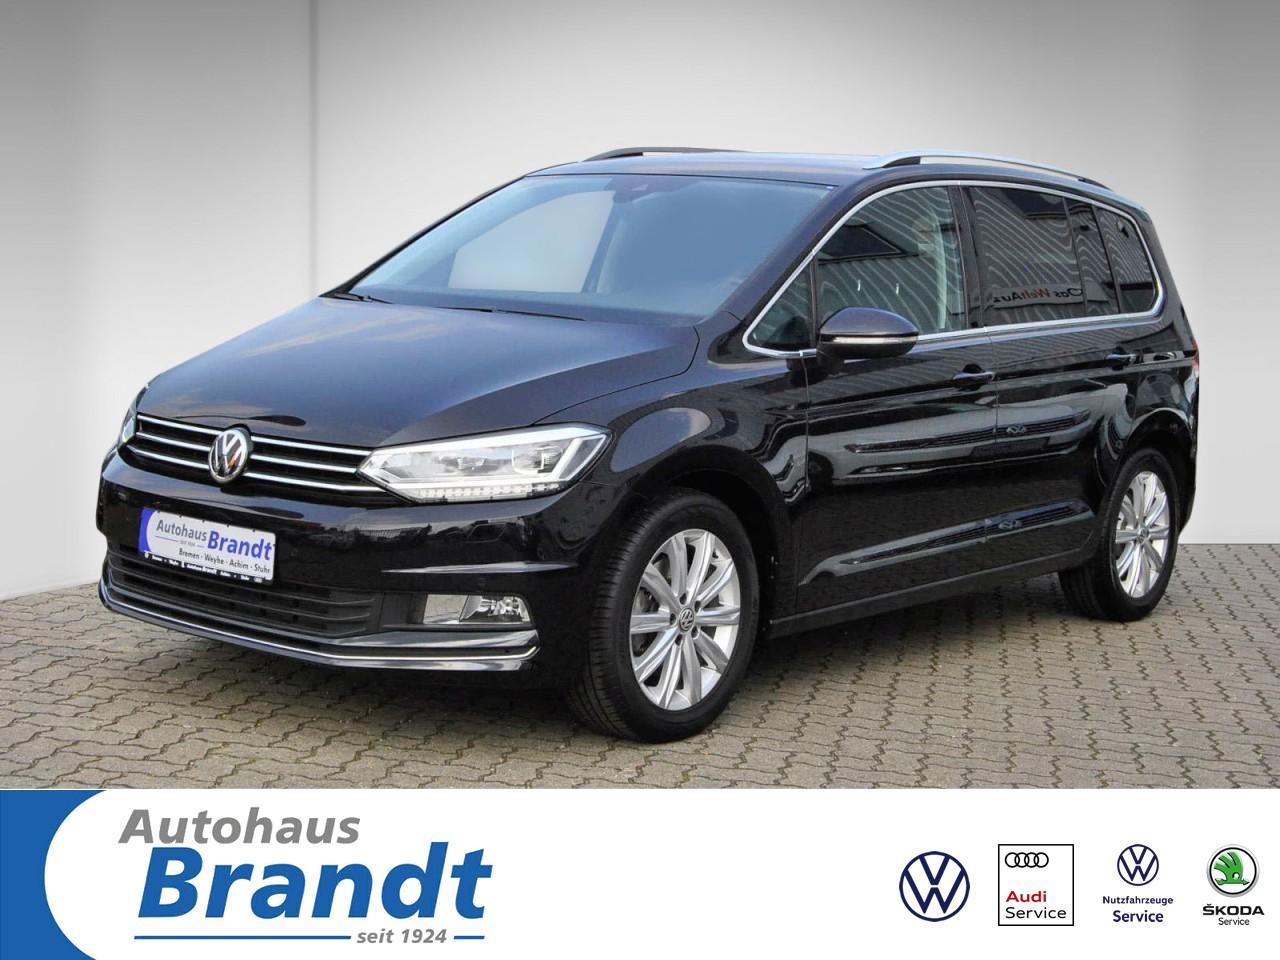 Volkswagen Touran 1.8 TSI Highline DSG NAVI*LED*PDC*SITZH:, Jahr 2017, Benzin